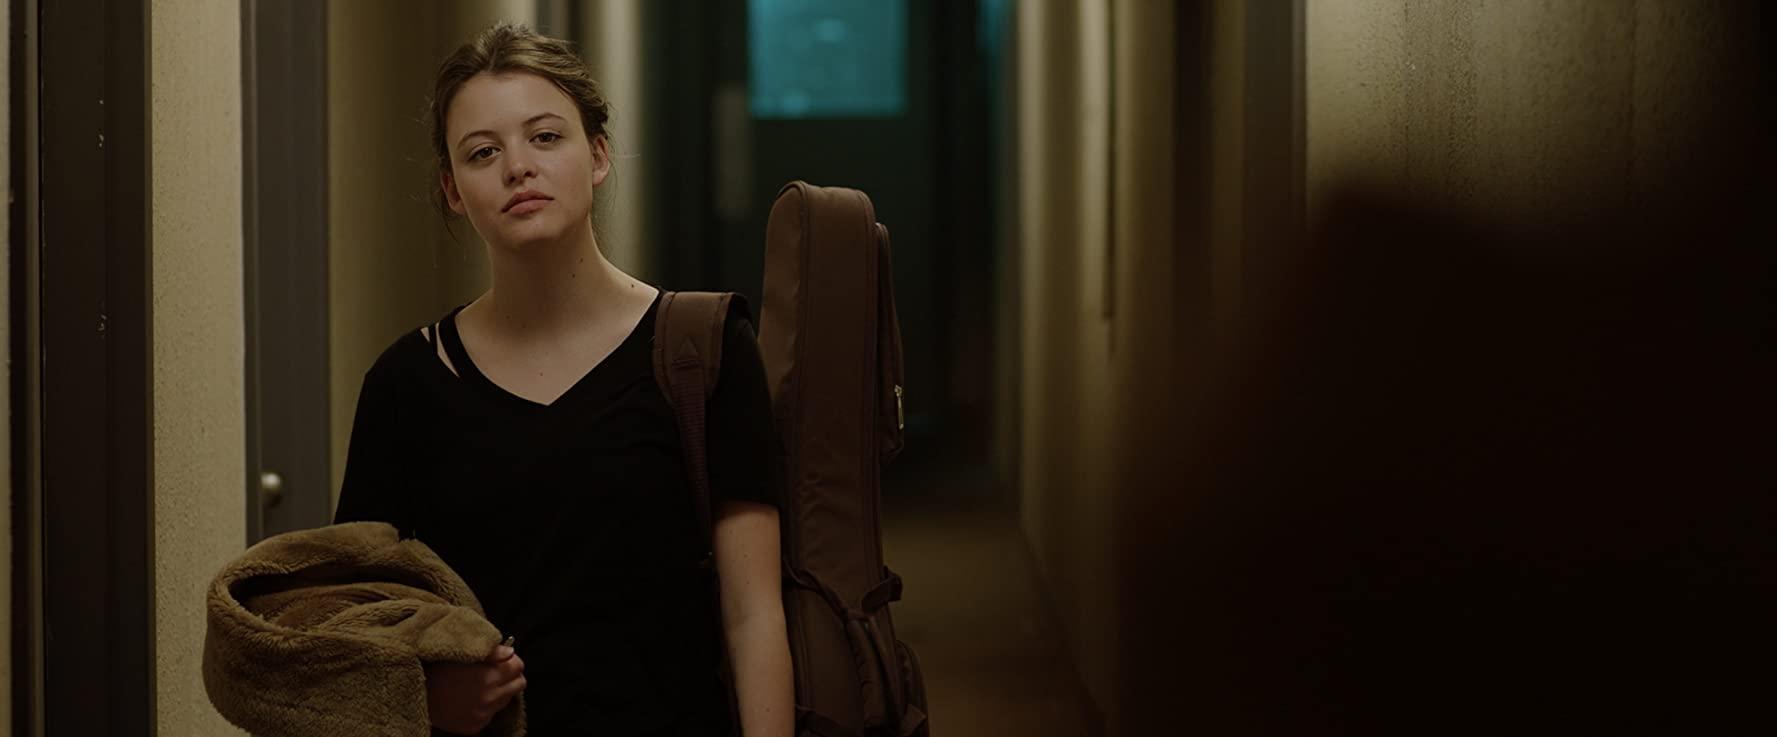 مشاهدة فيلم Tainted (2020) مترجم HD اون لاين